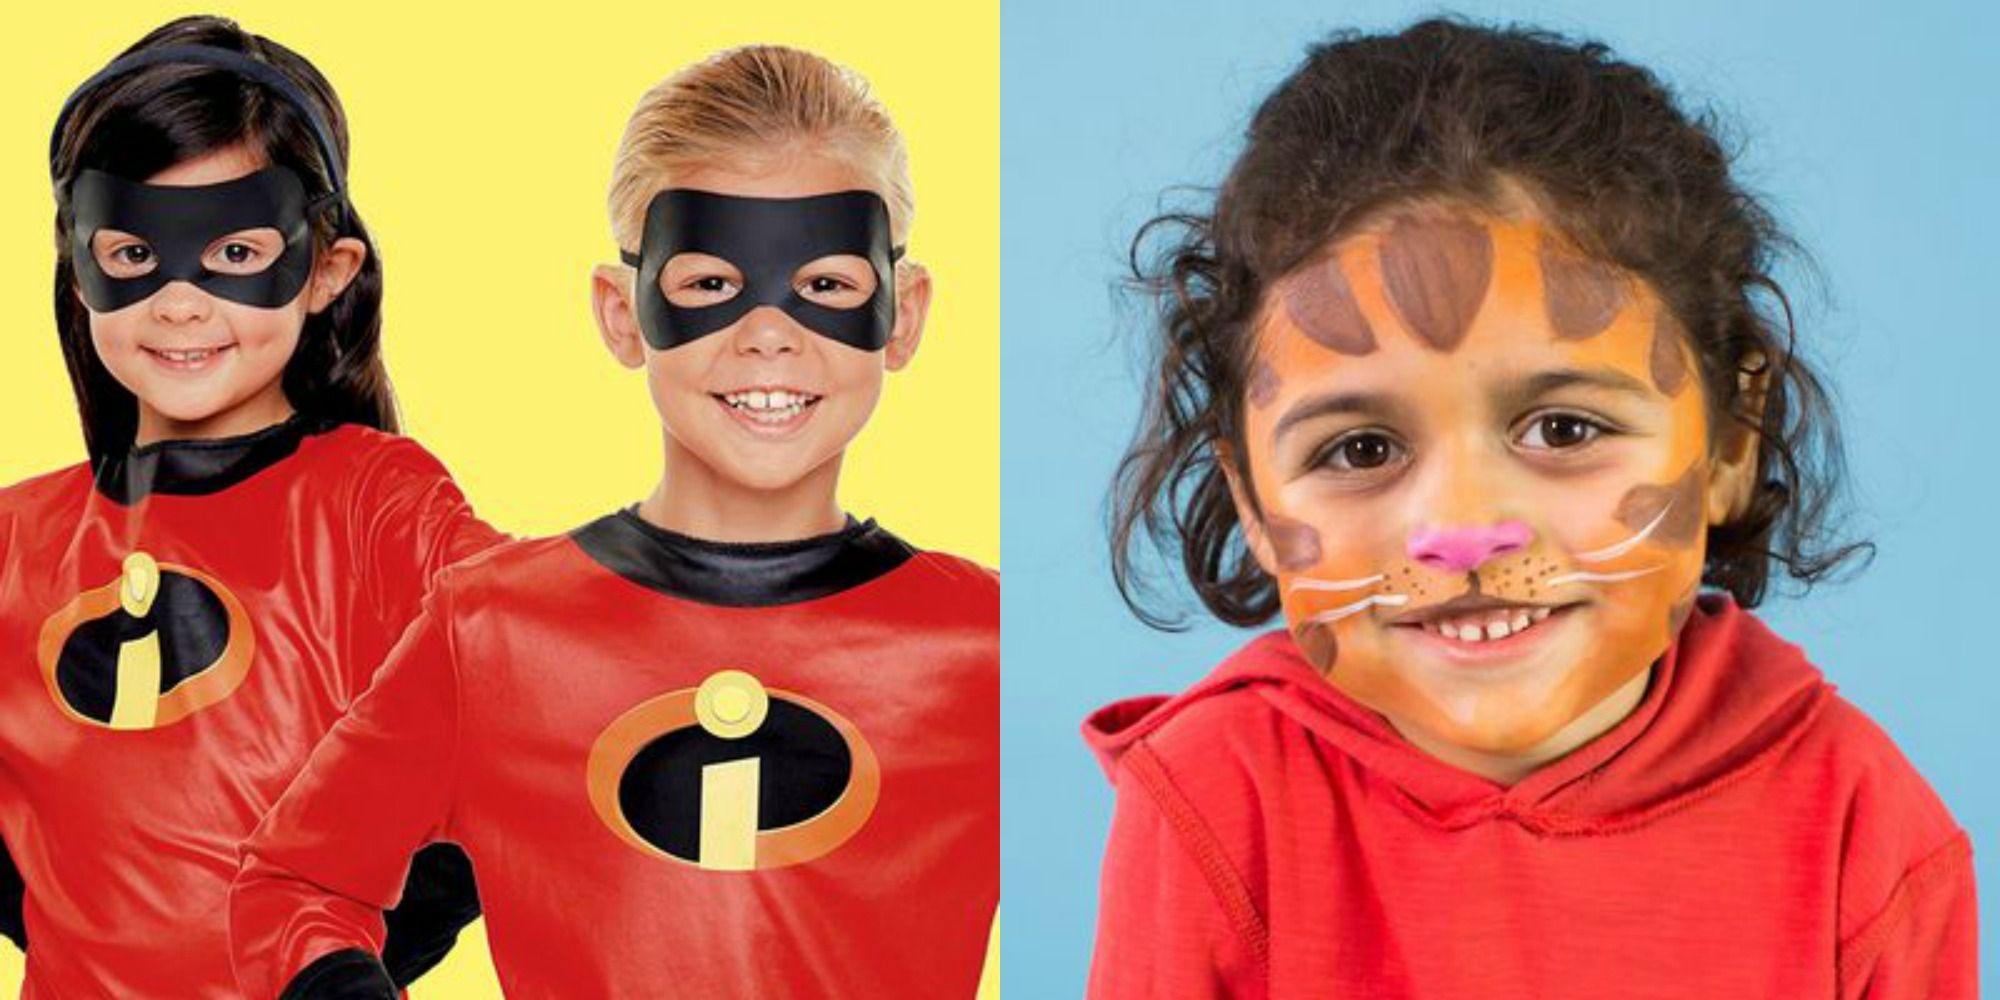 26 Best Halloween Costumes For Kids 2018